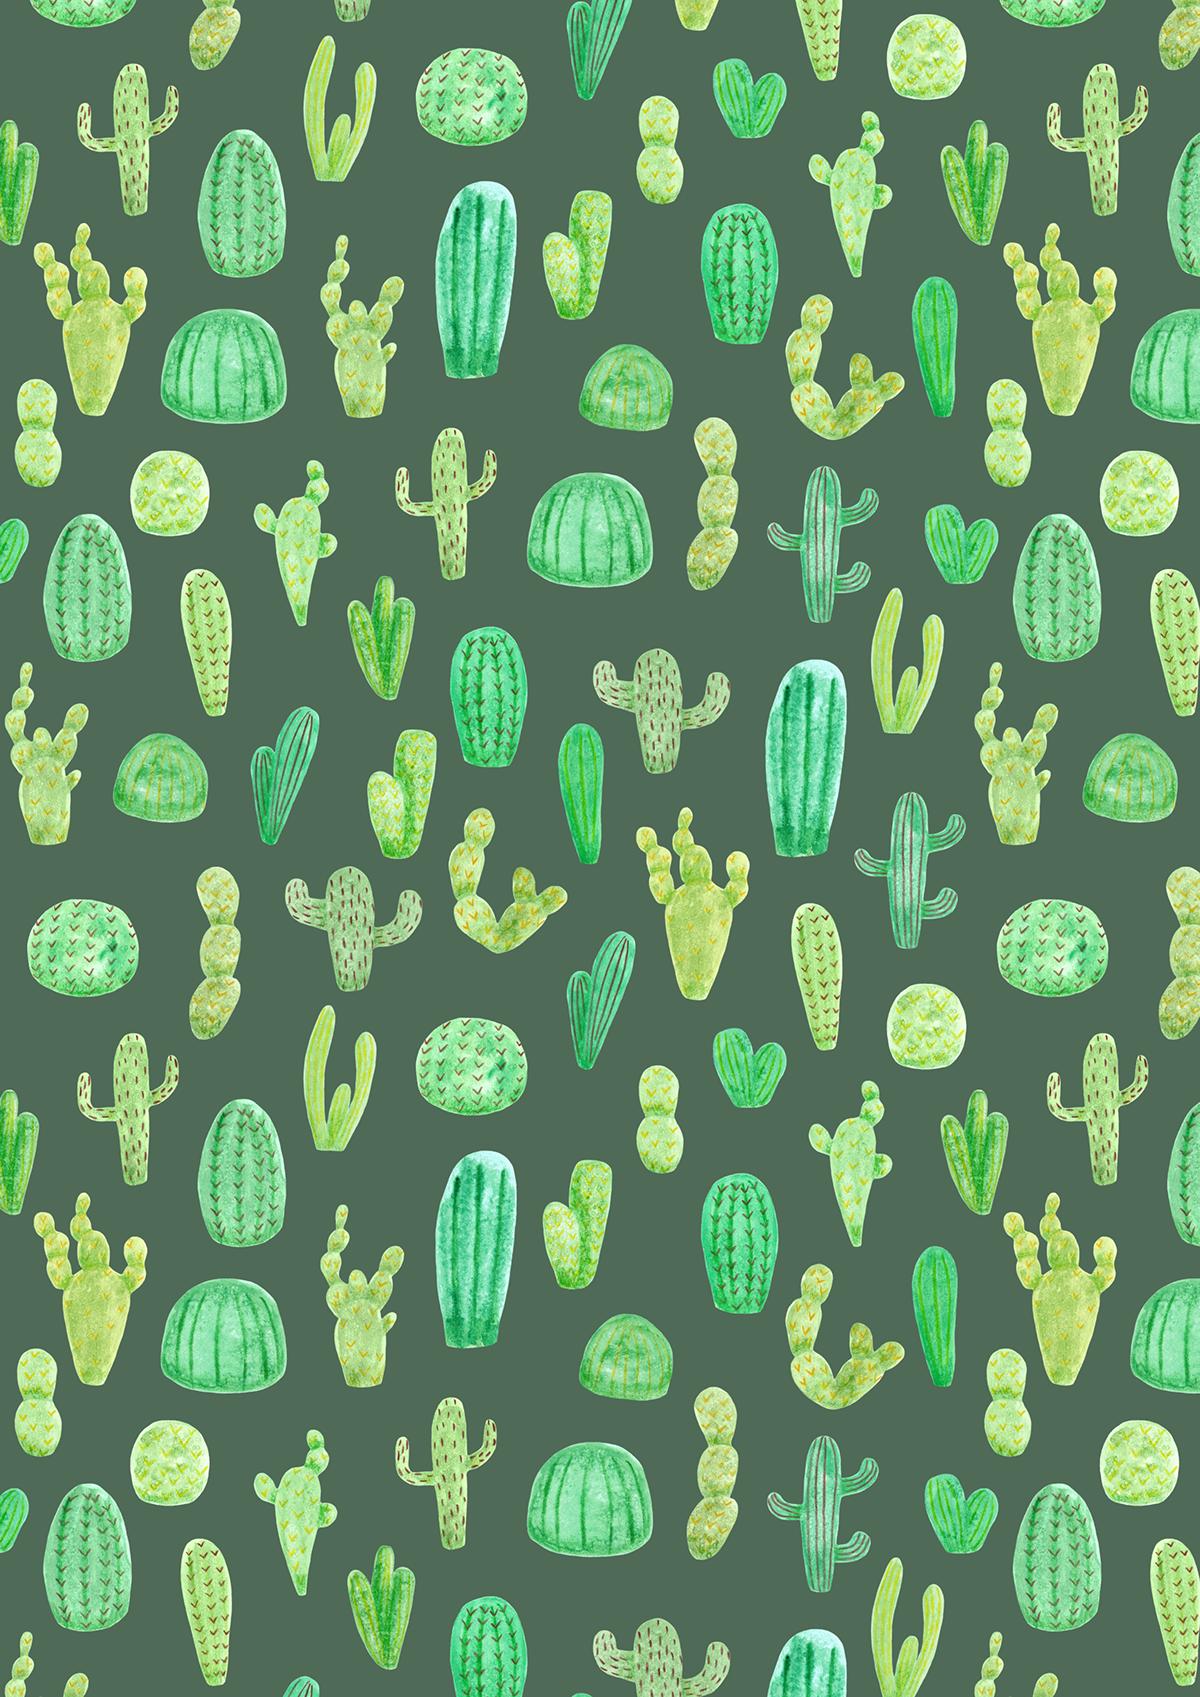 cactus pattern cacti pattern design  green Nature watercolour cactus illustration cacti pattern nature pattern plants